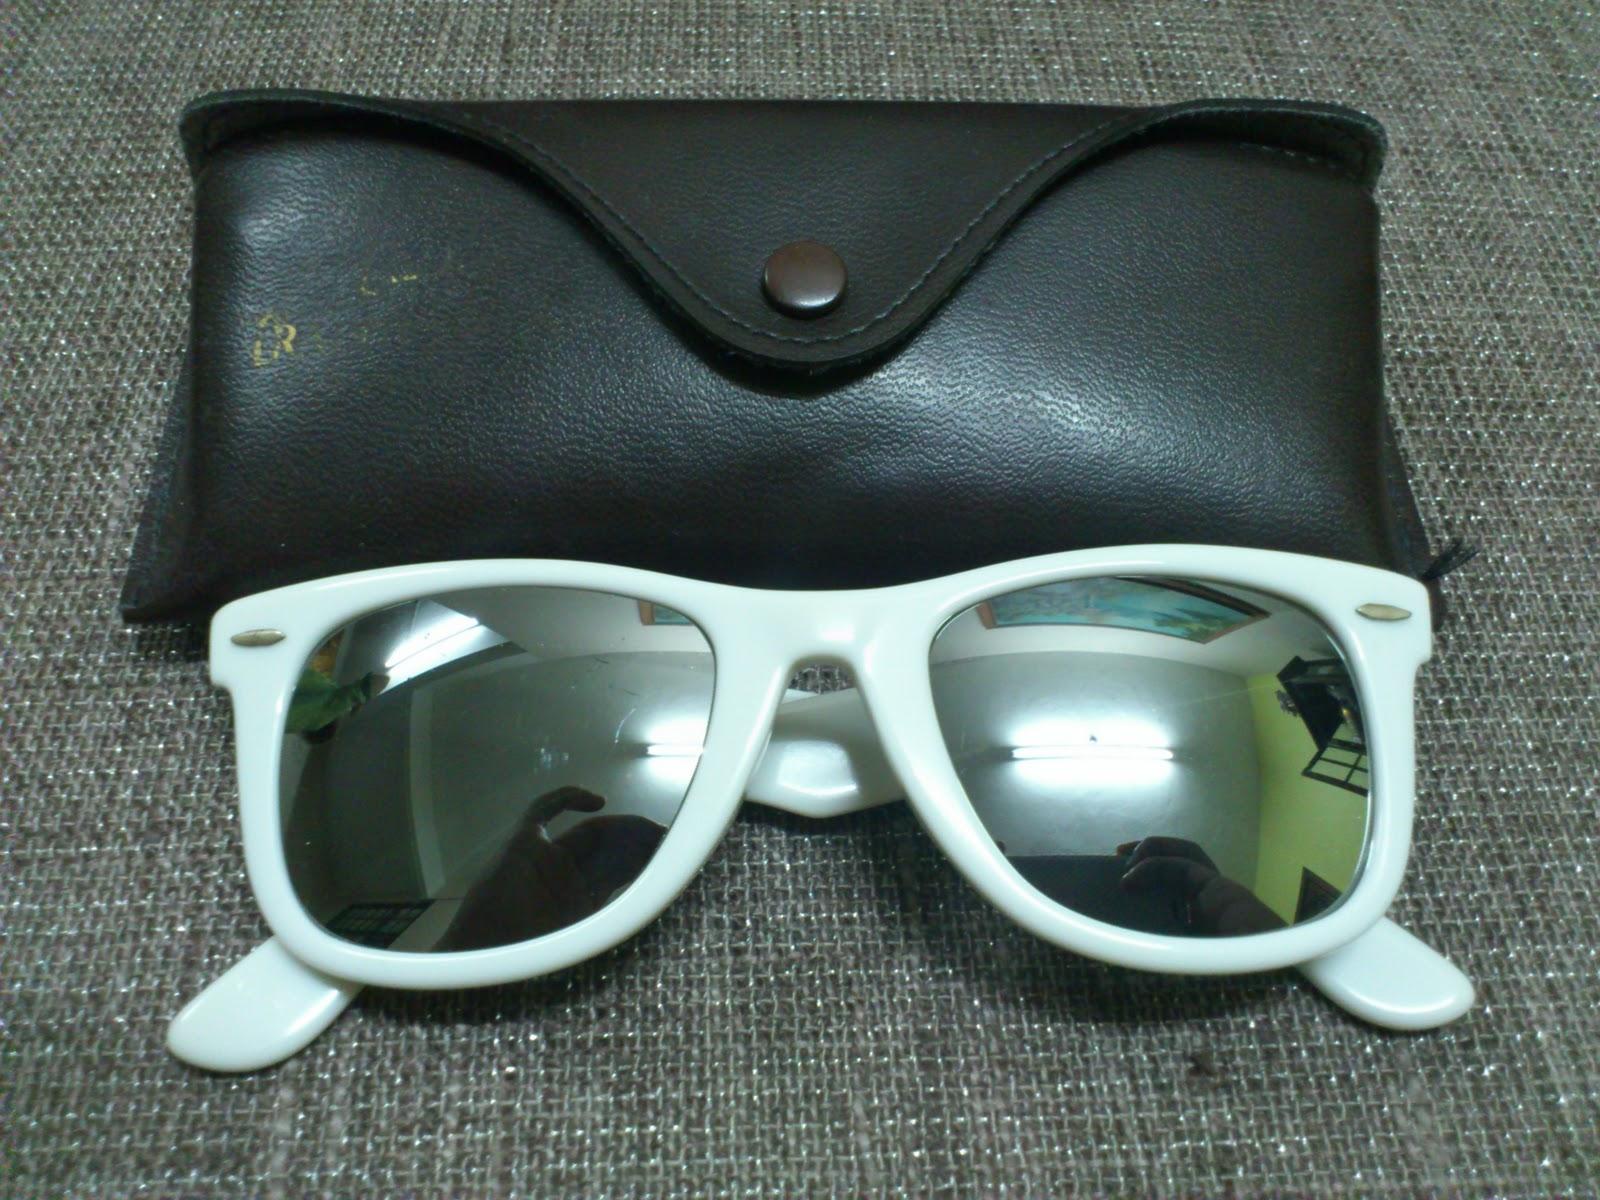 0091470e1c Vintage Bausch   Lomb Rayban Sunglasses  (SOLD)Ray Ban Wayfarer ...